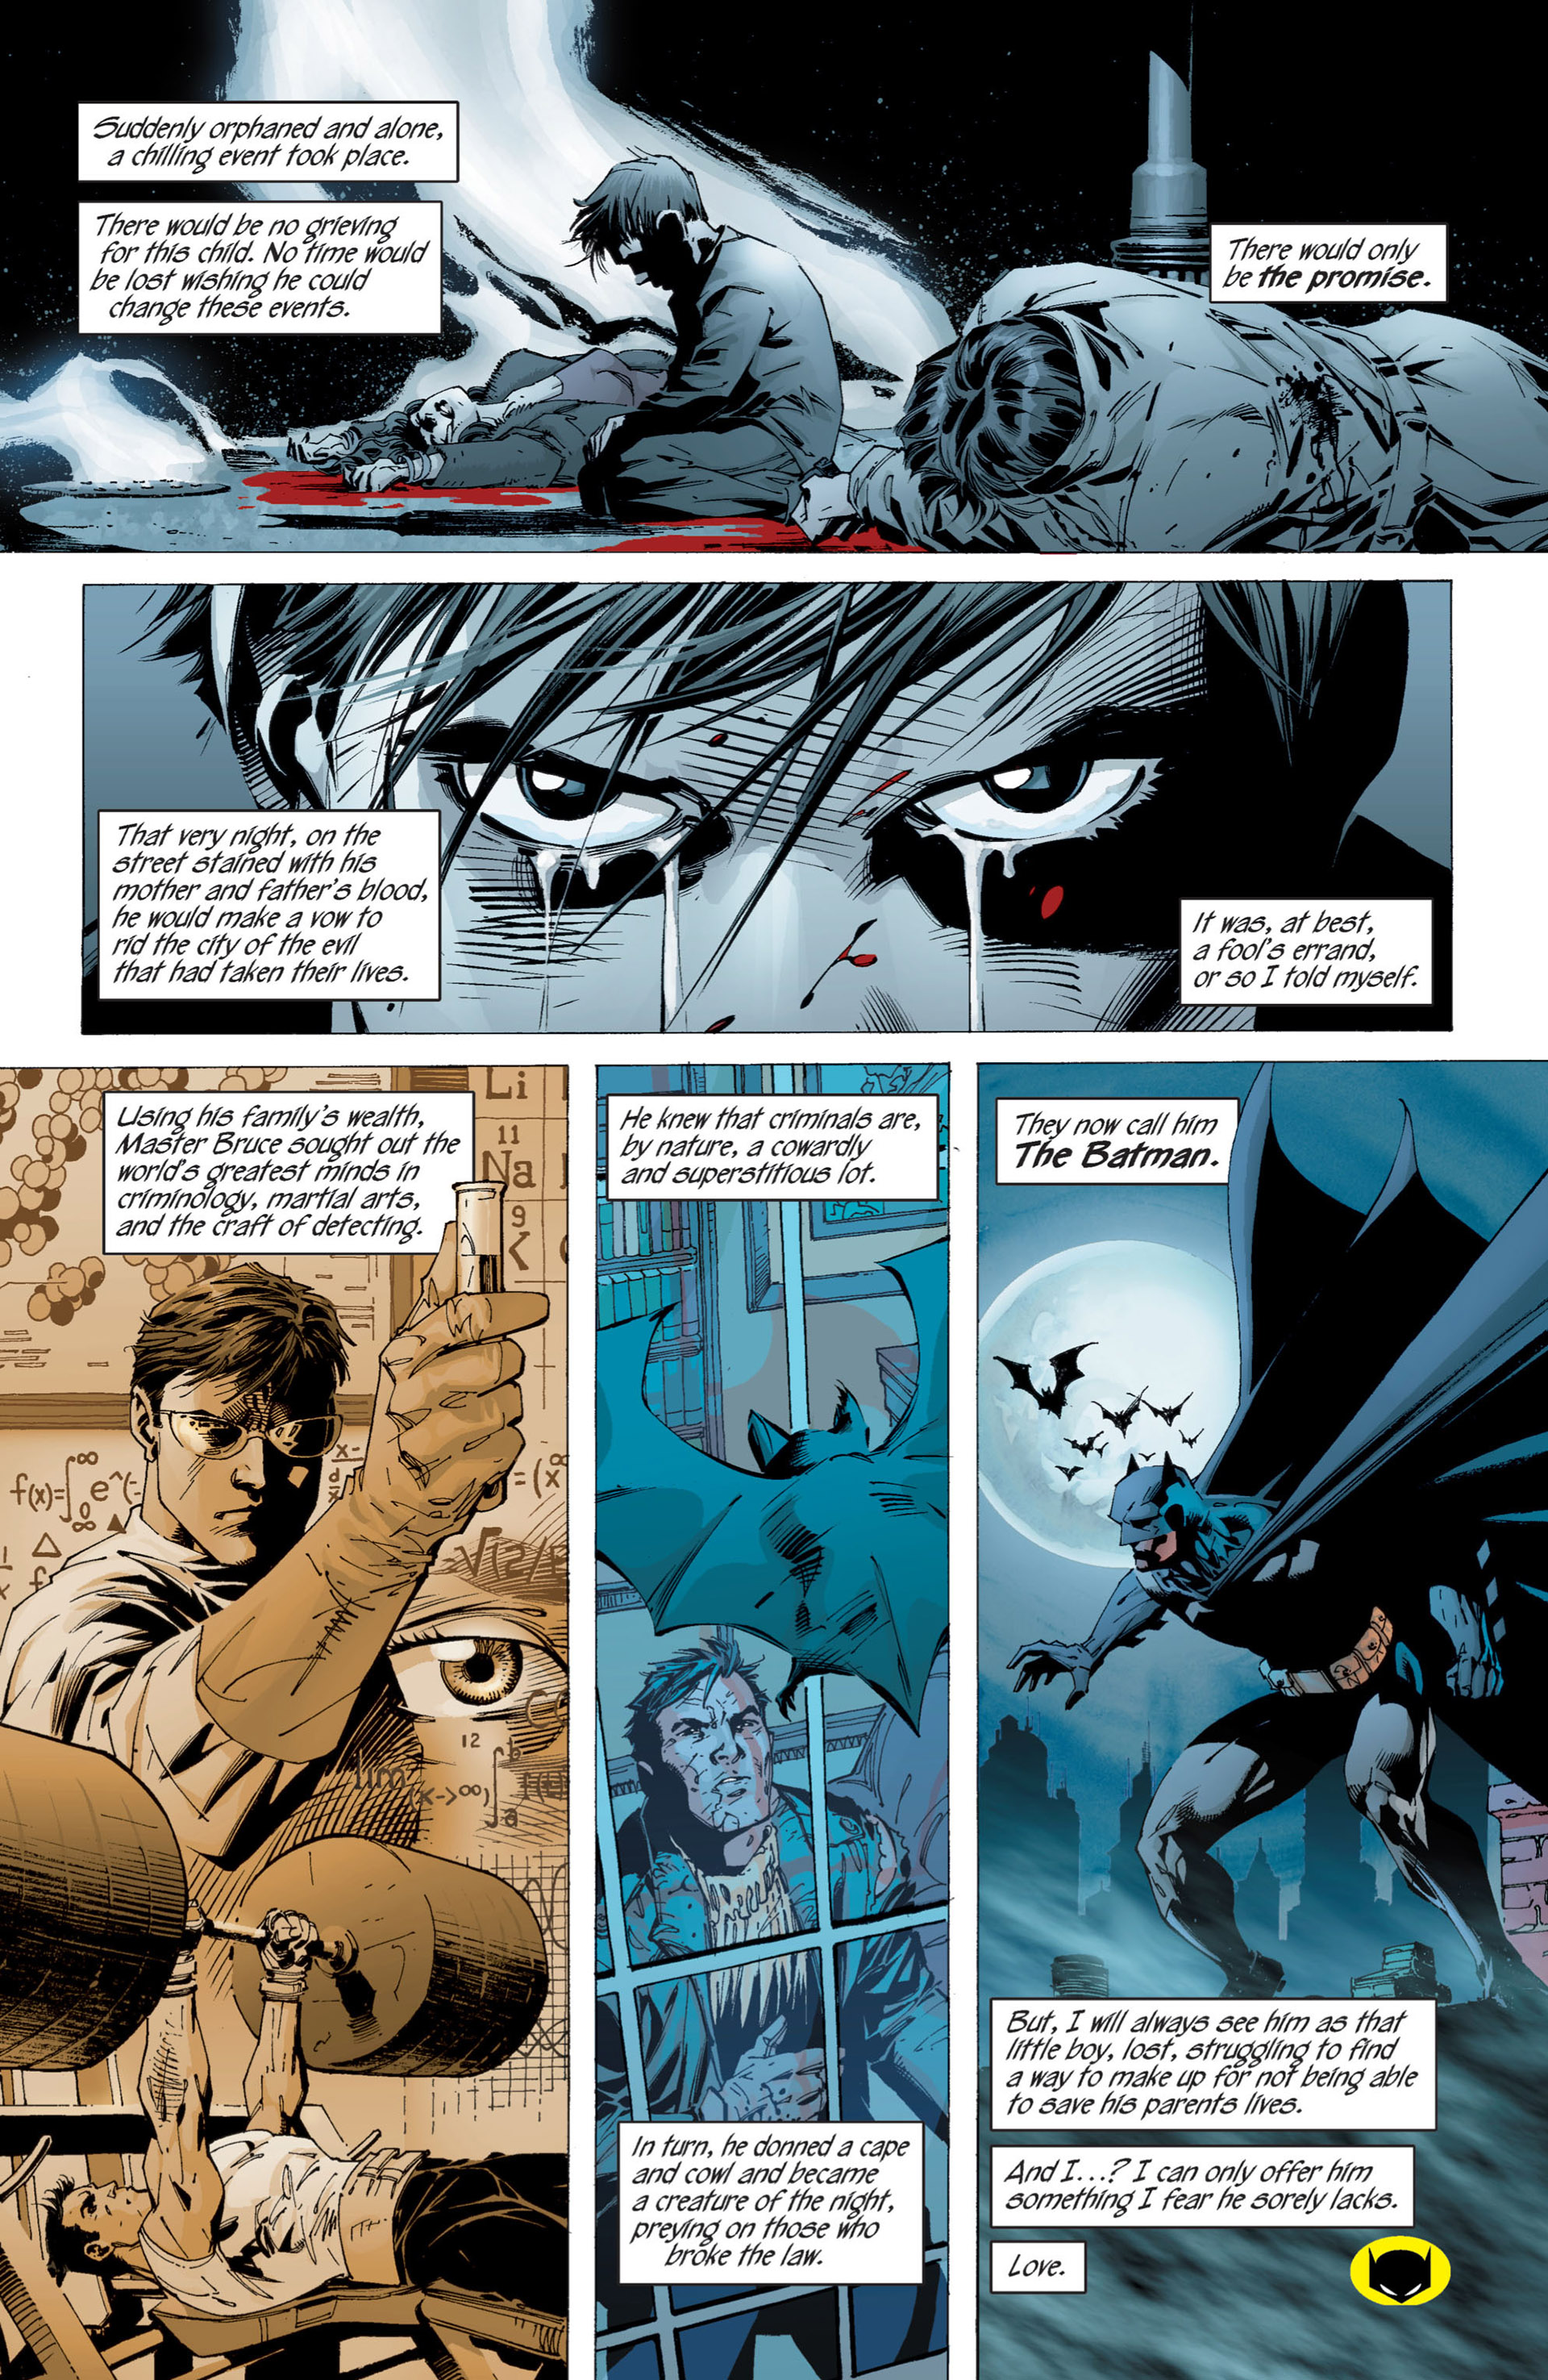 Psychology of Bruce Wayne ZYkpeC0tt5aBVpYK1h_Om0-7zfItynj3uu6Sk5_1X9ozwx-IHy_COyLH_jk9CMX1o_IoJoxsqmO1=s0